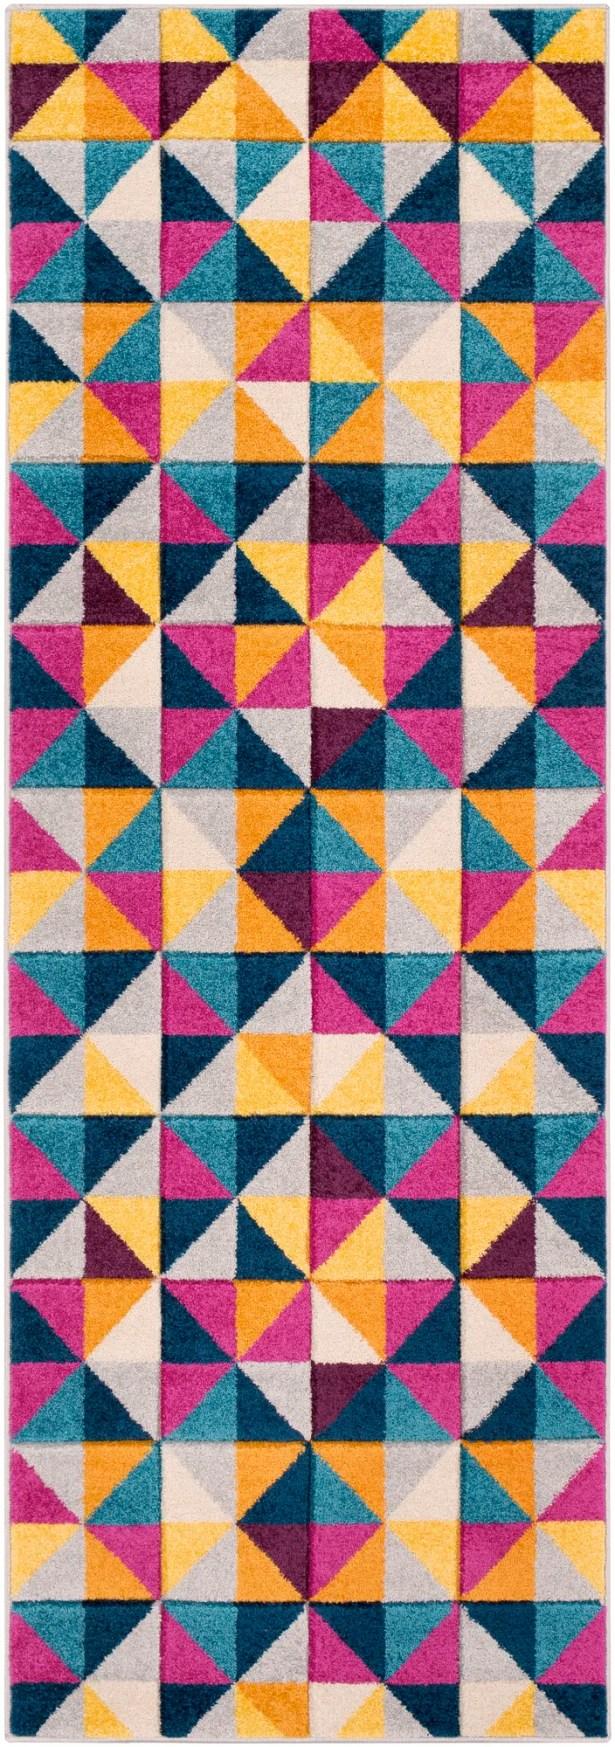 Puleo Geometric Gray/Blue Area Rug Rug Size: Rectangle 5'3